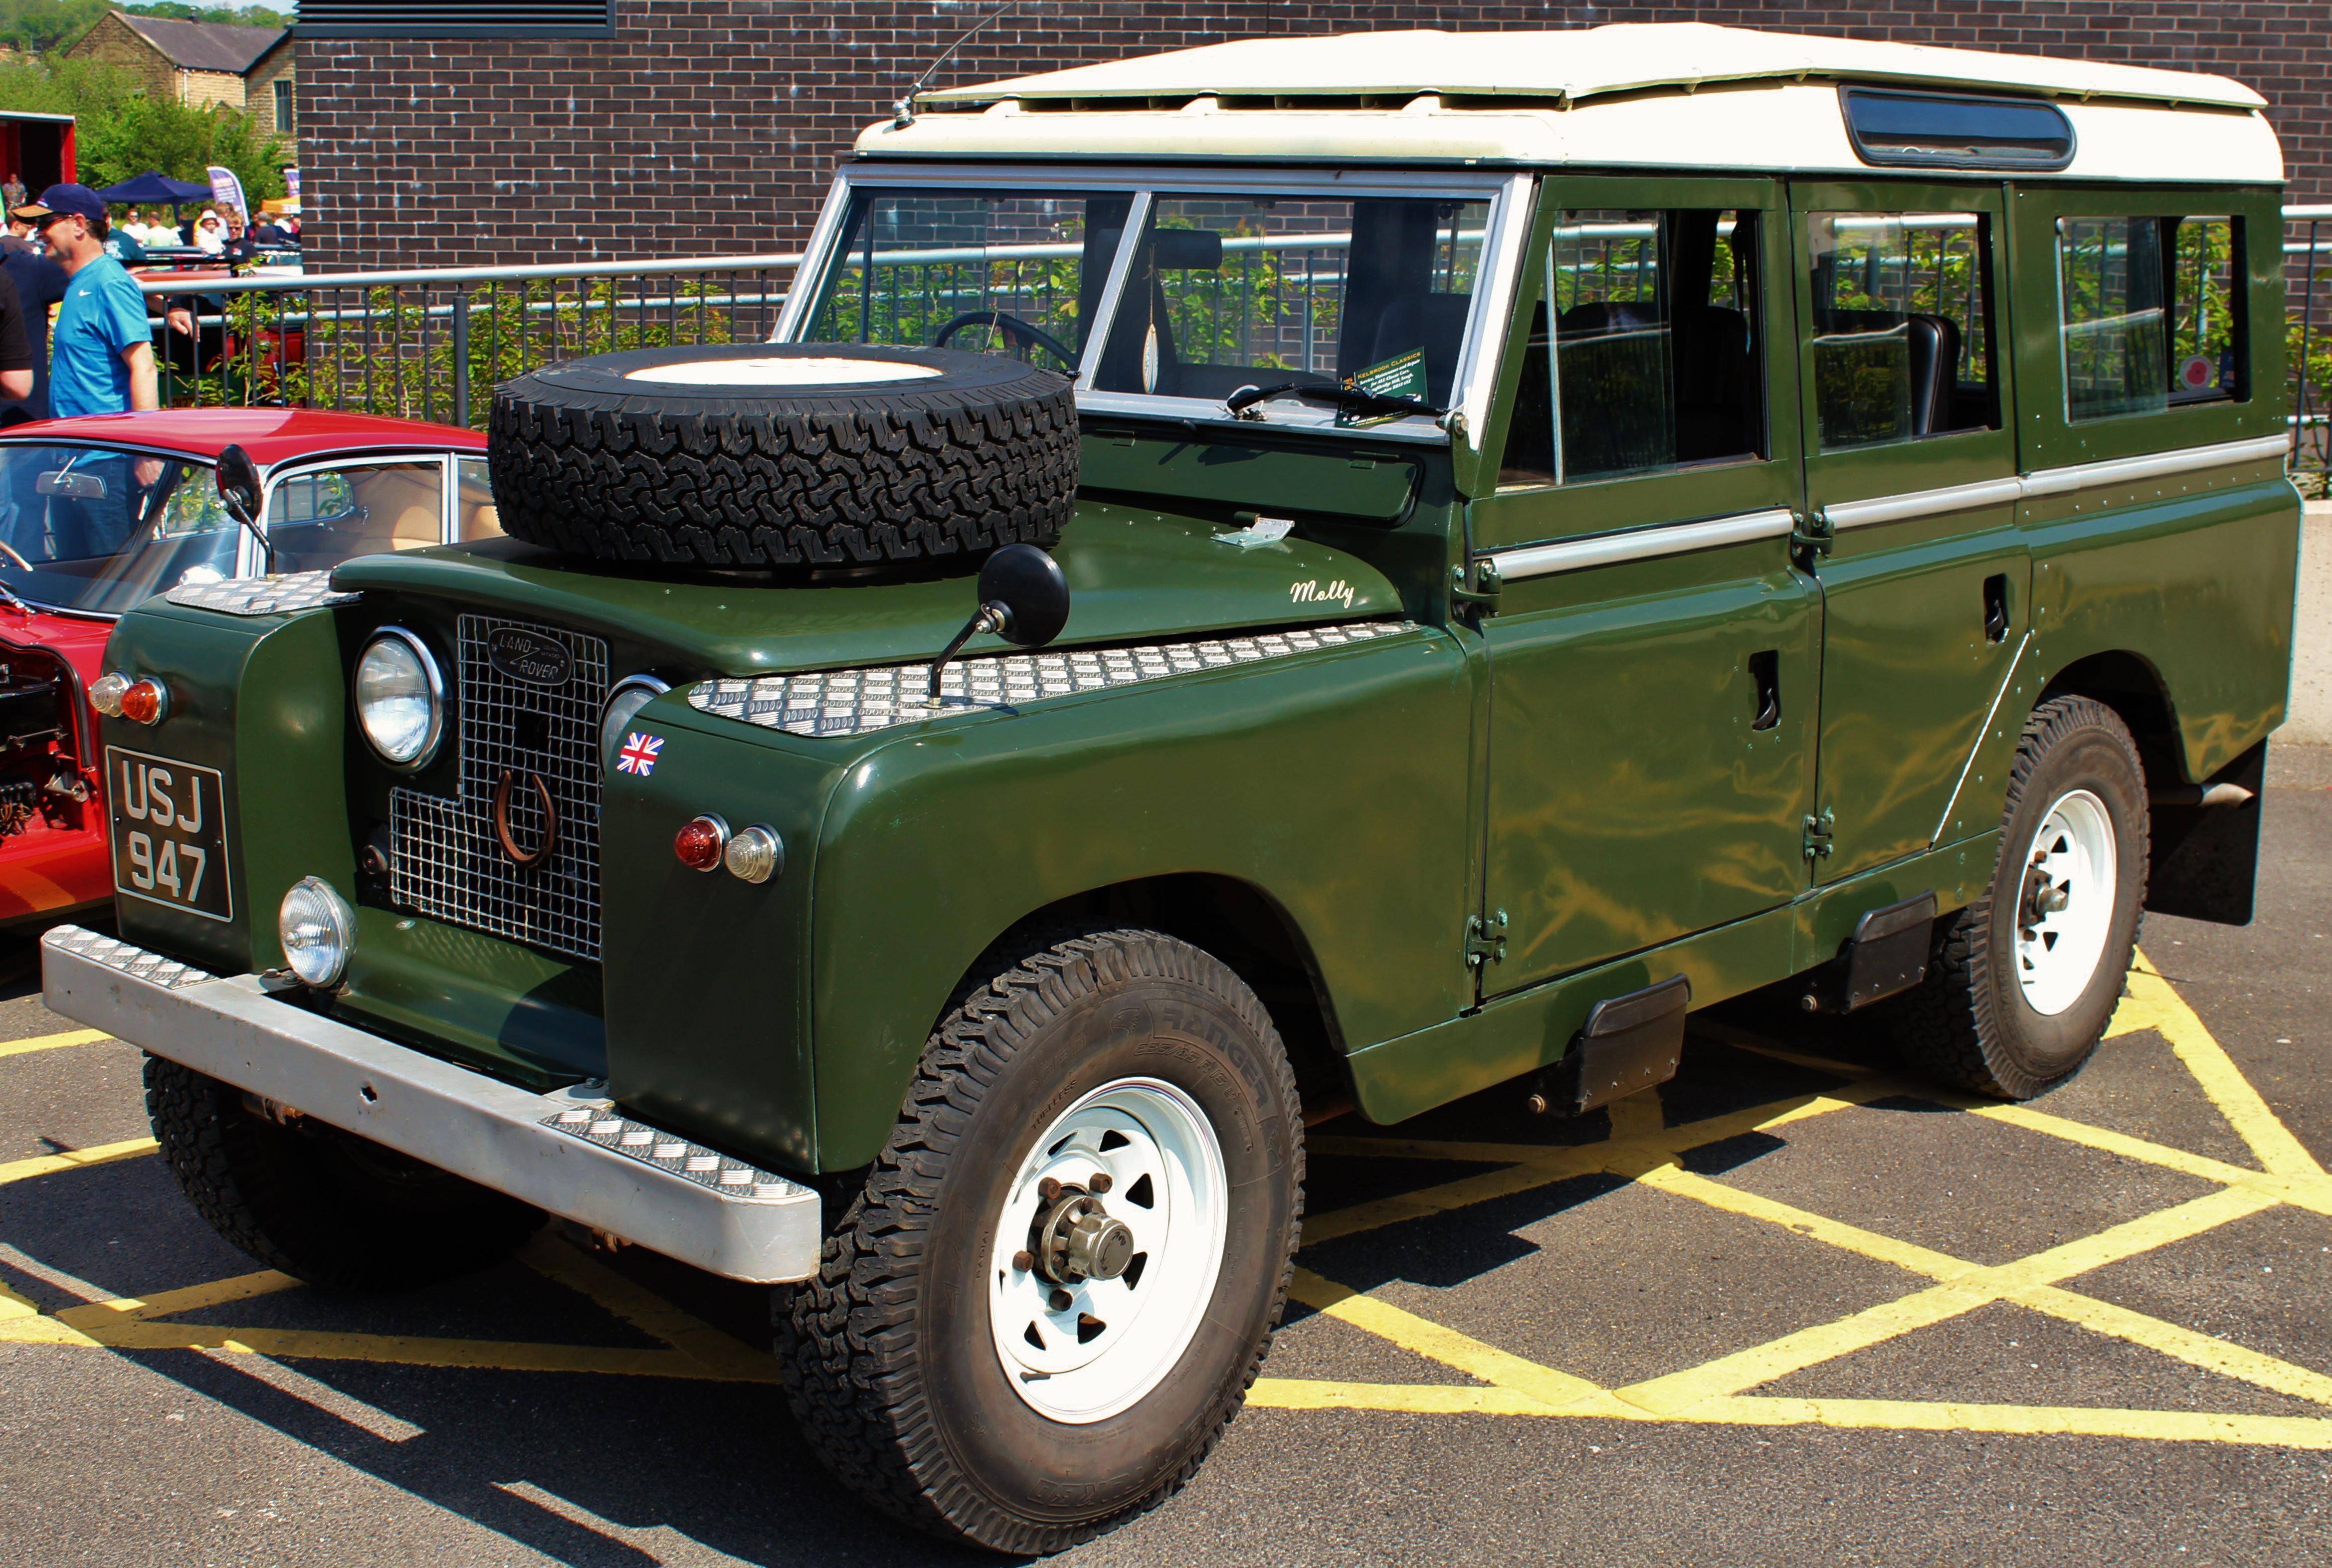 Land_Rover_Series_IIa_long_wheel_Base_(26793951814).jpg